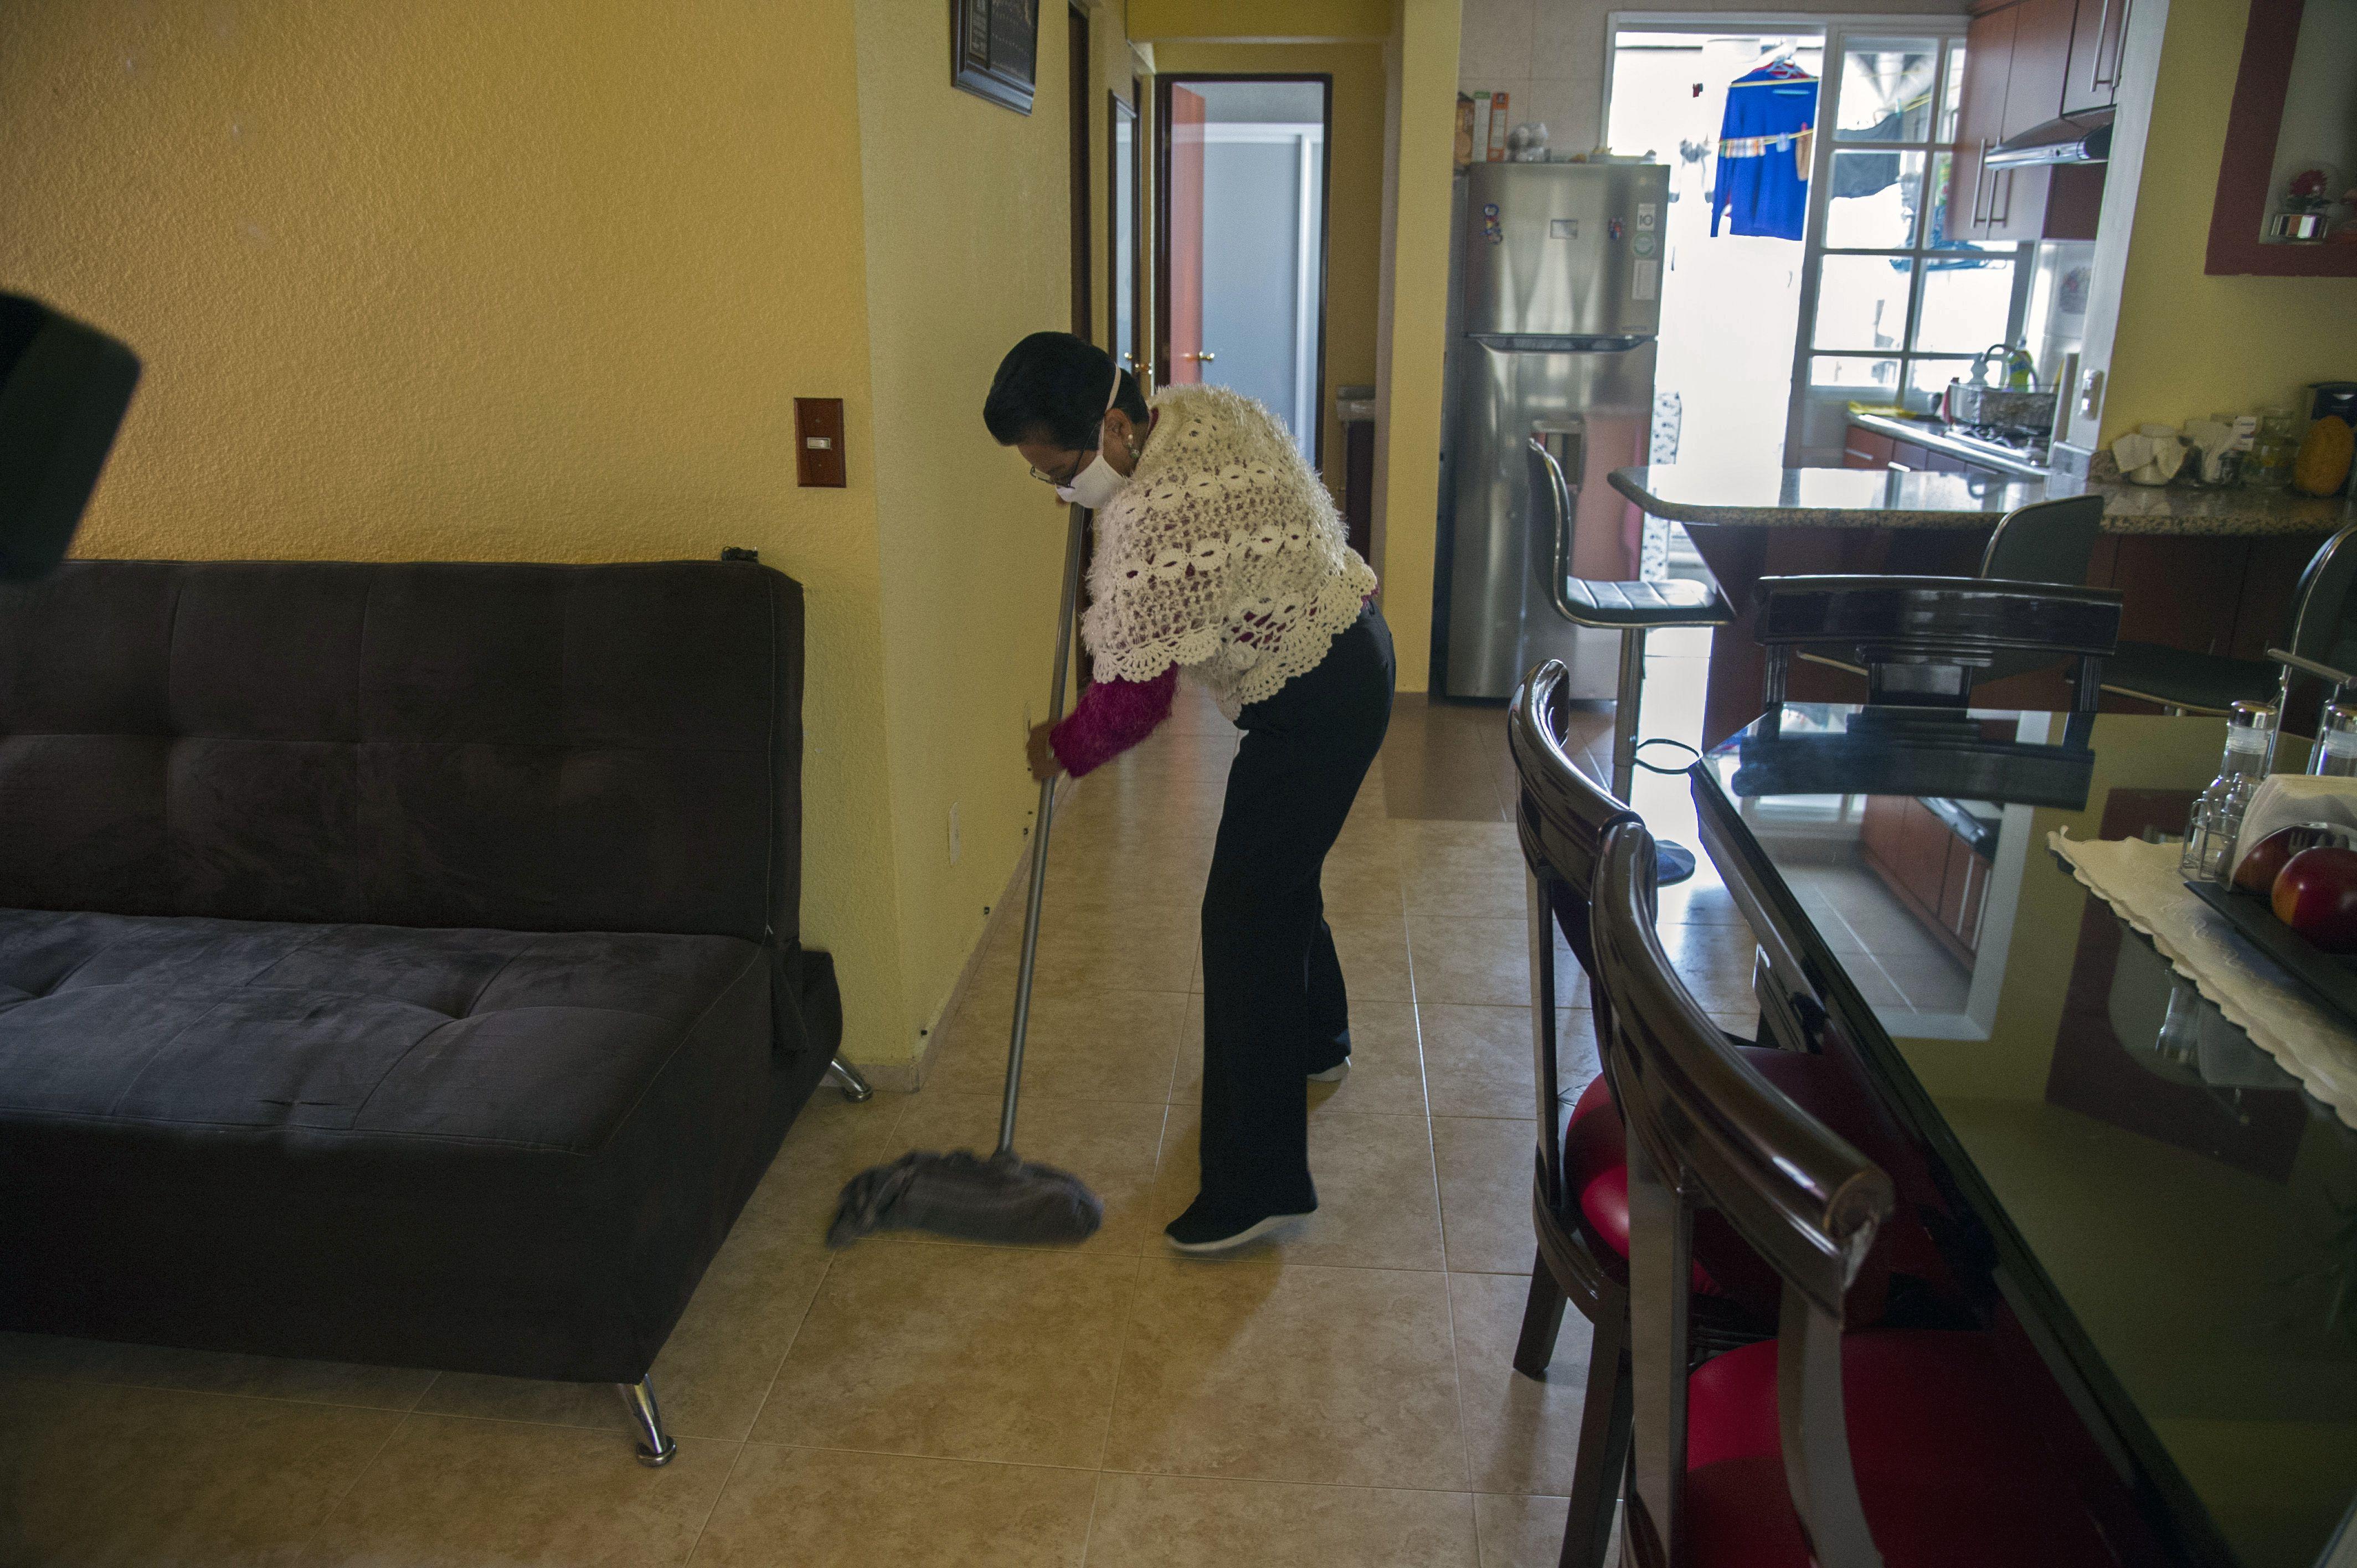 empleadas domesticas - mexico - 26062020